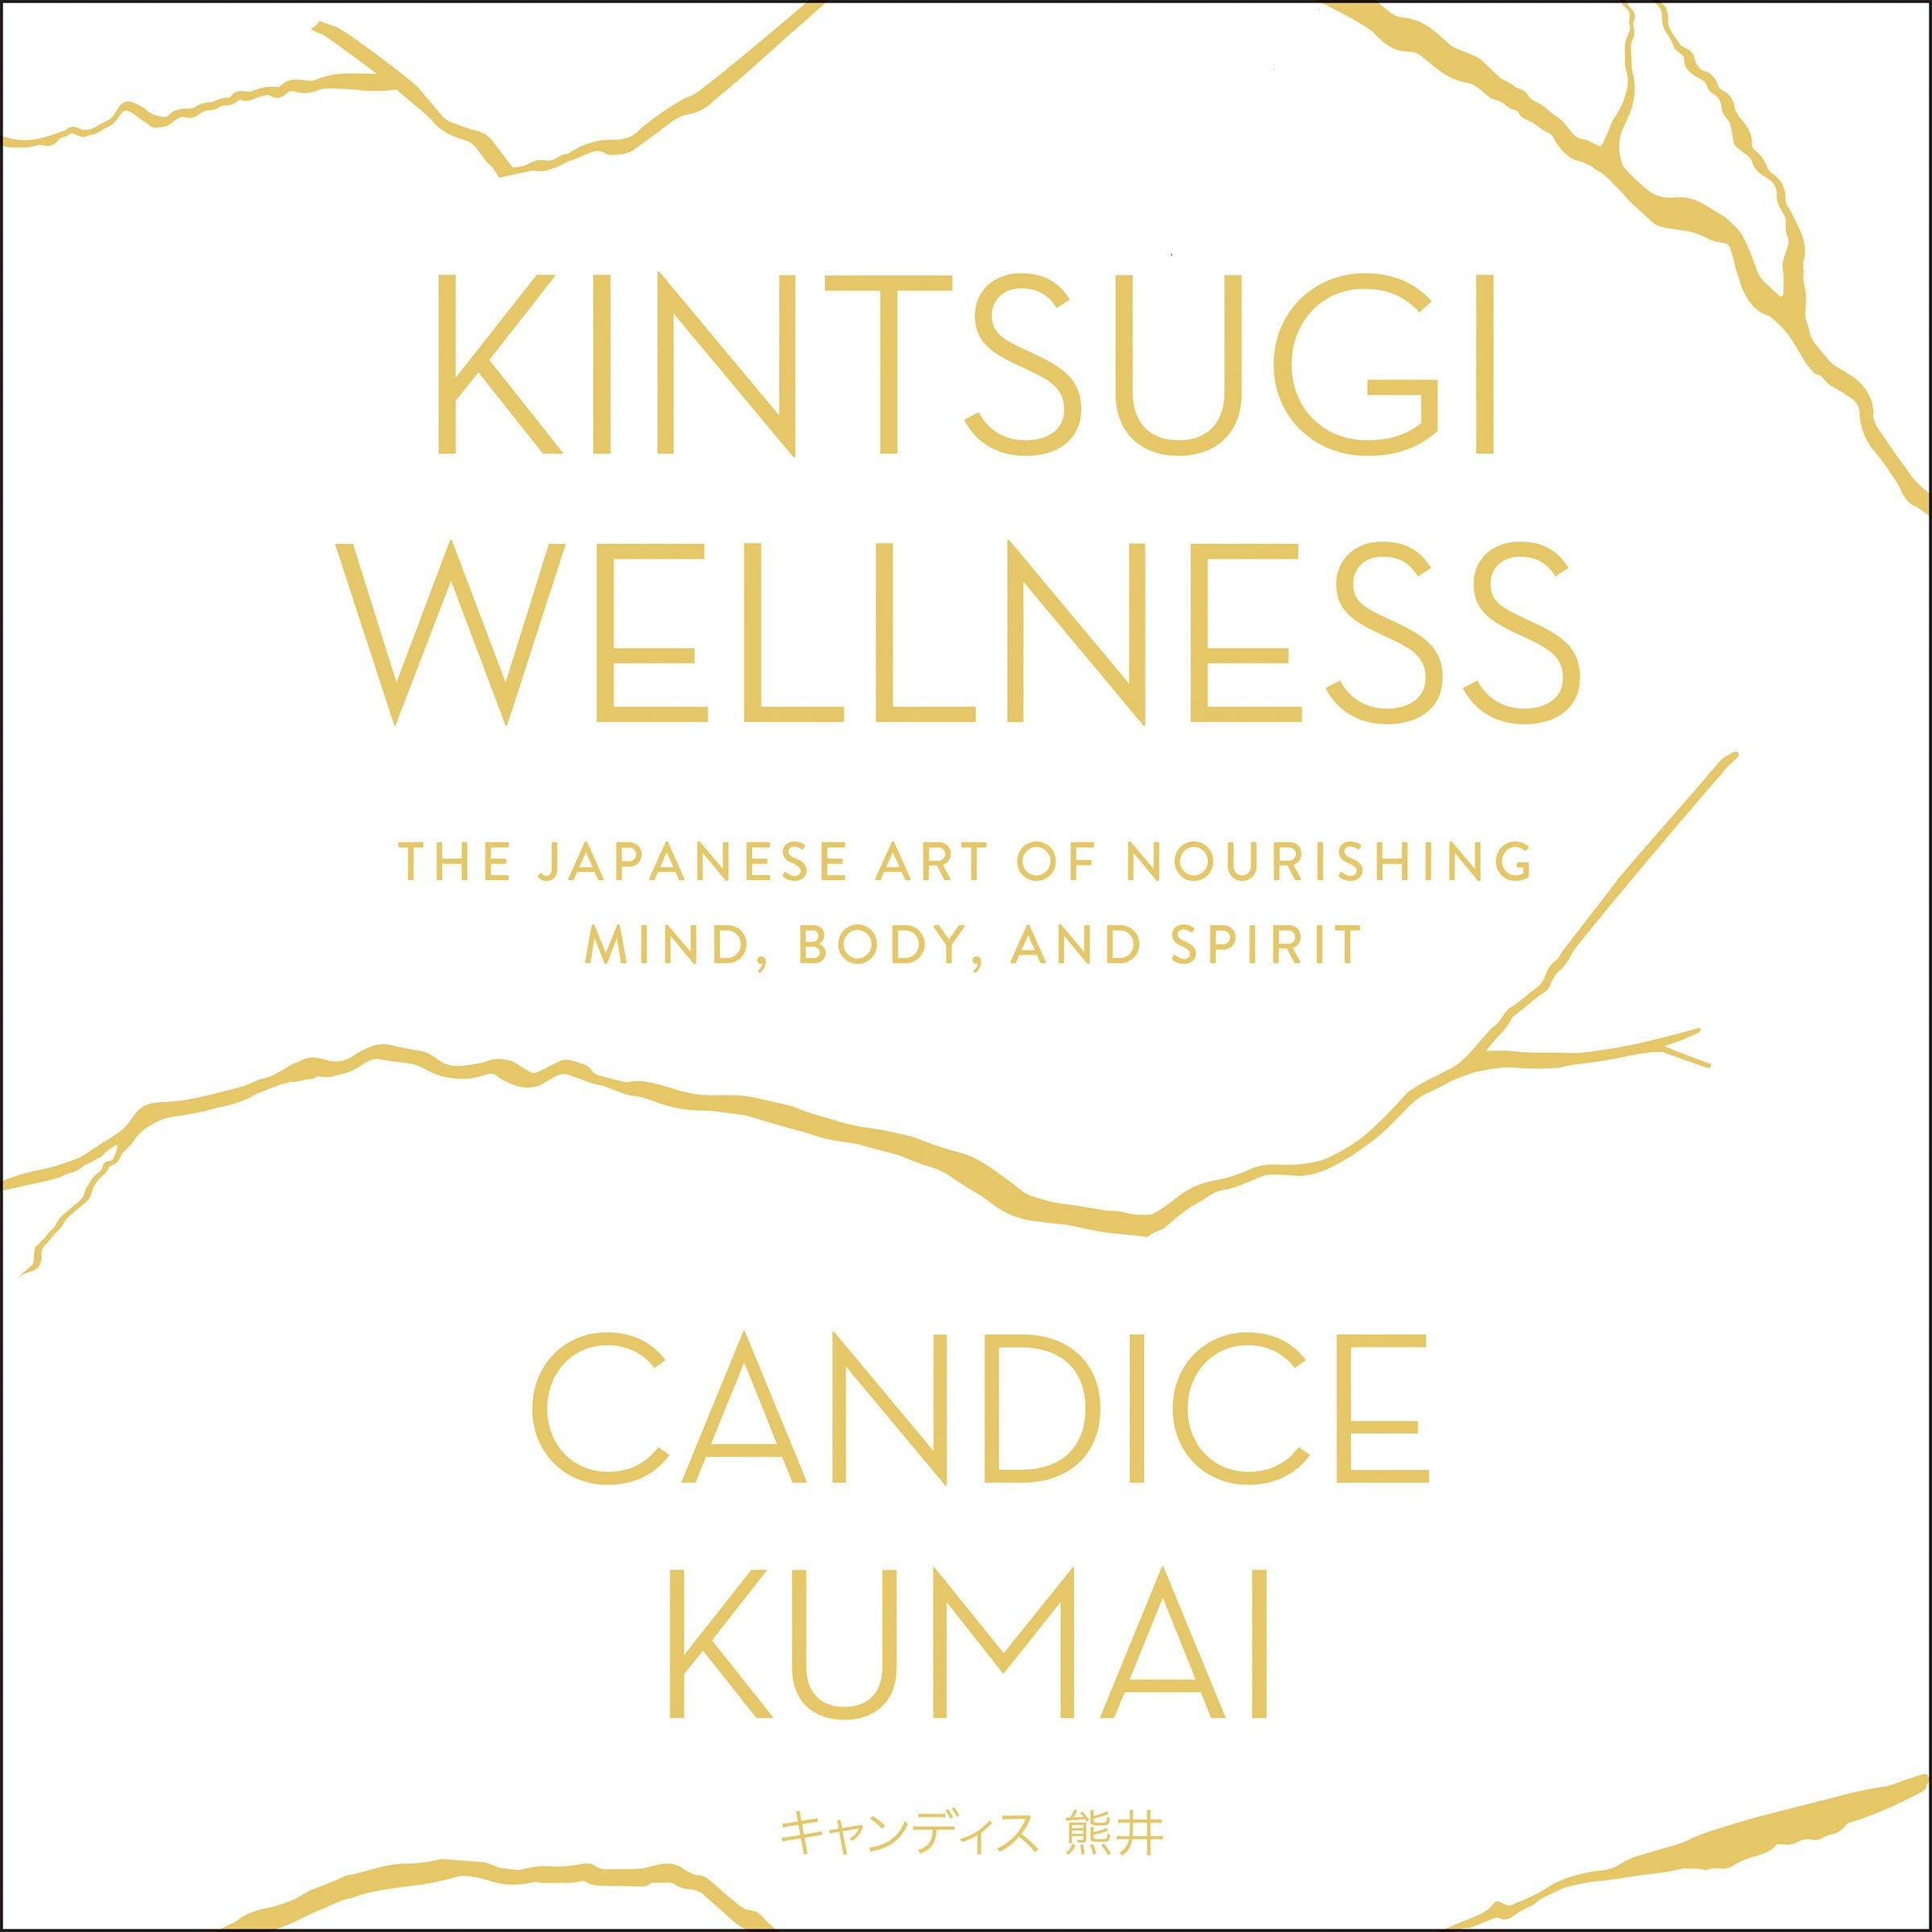 Kintsugi Wellness: The Japanese Art of Nourishing Mind, Body, and Soul